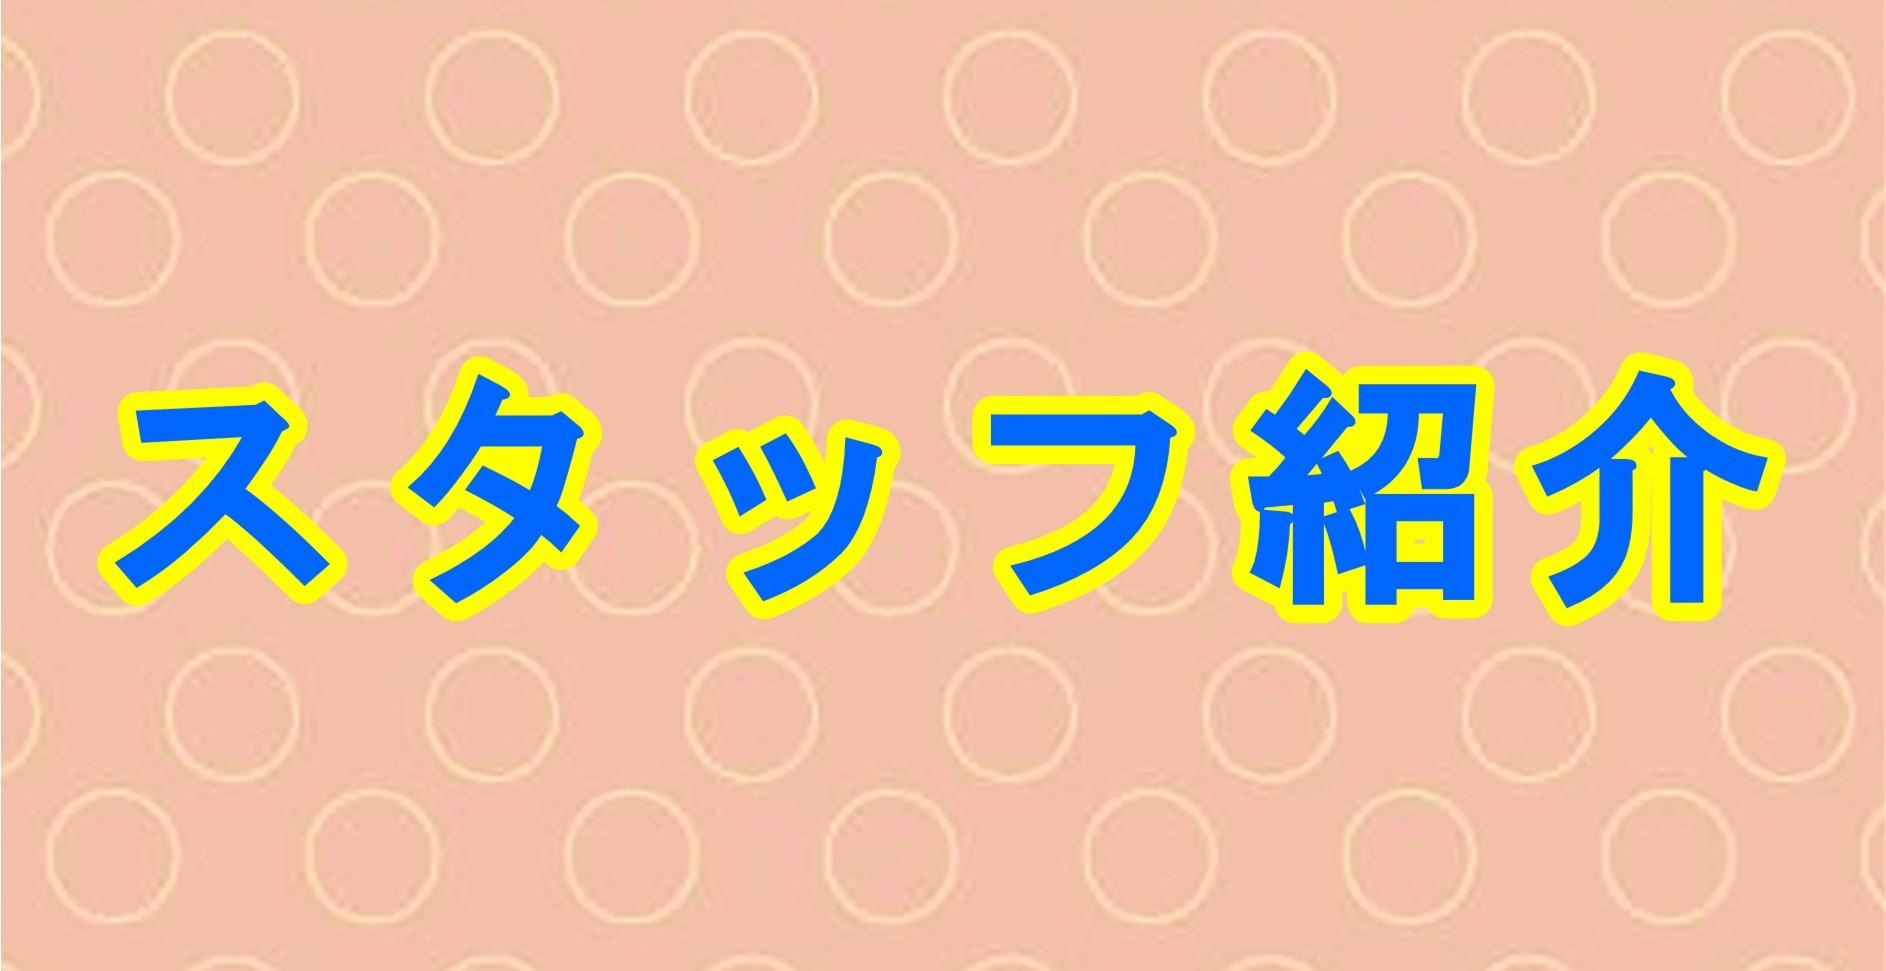 4 banners JPG staff